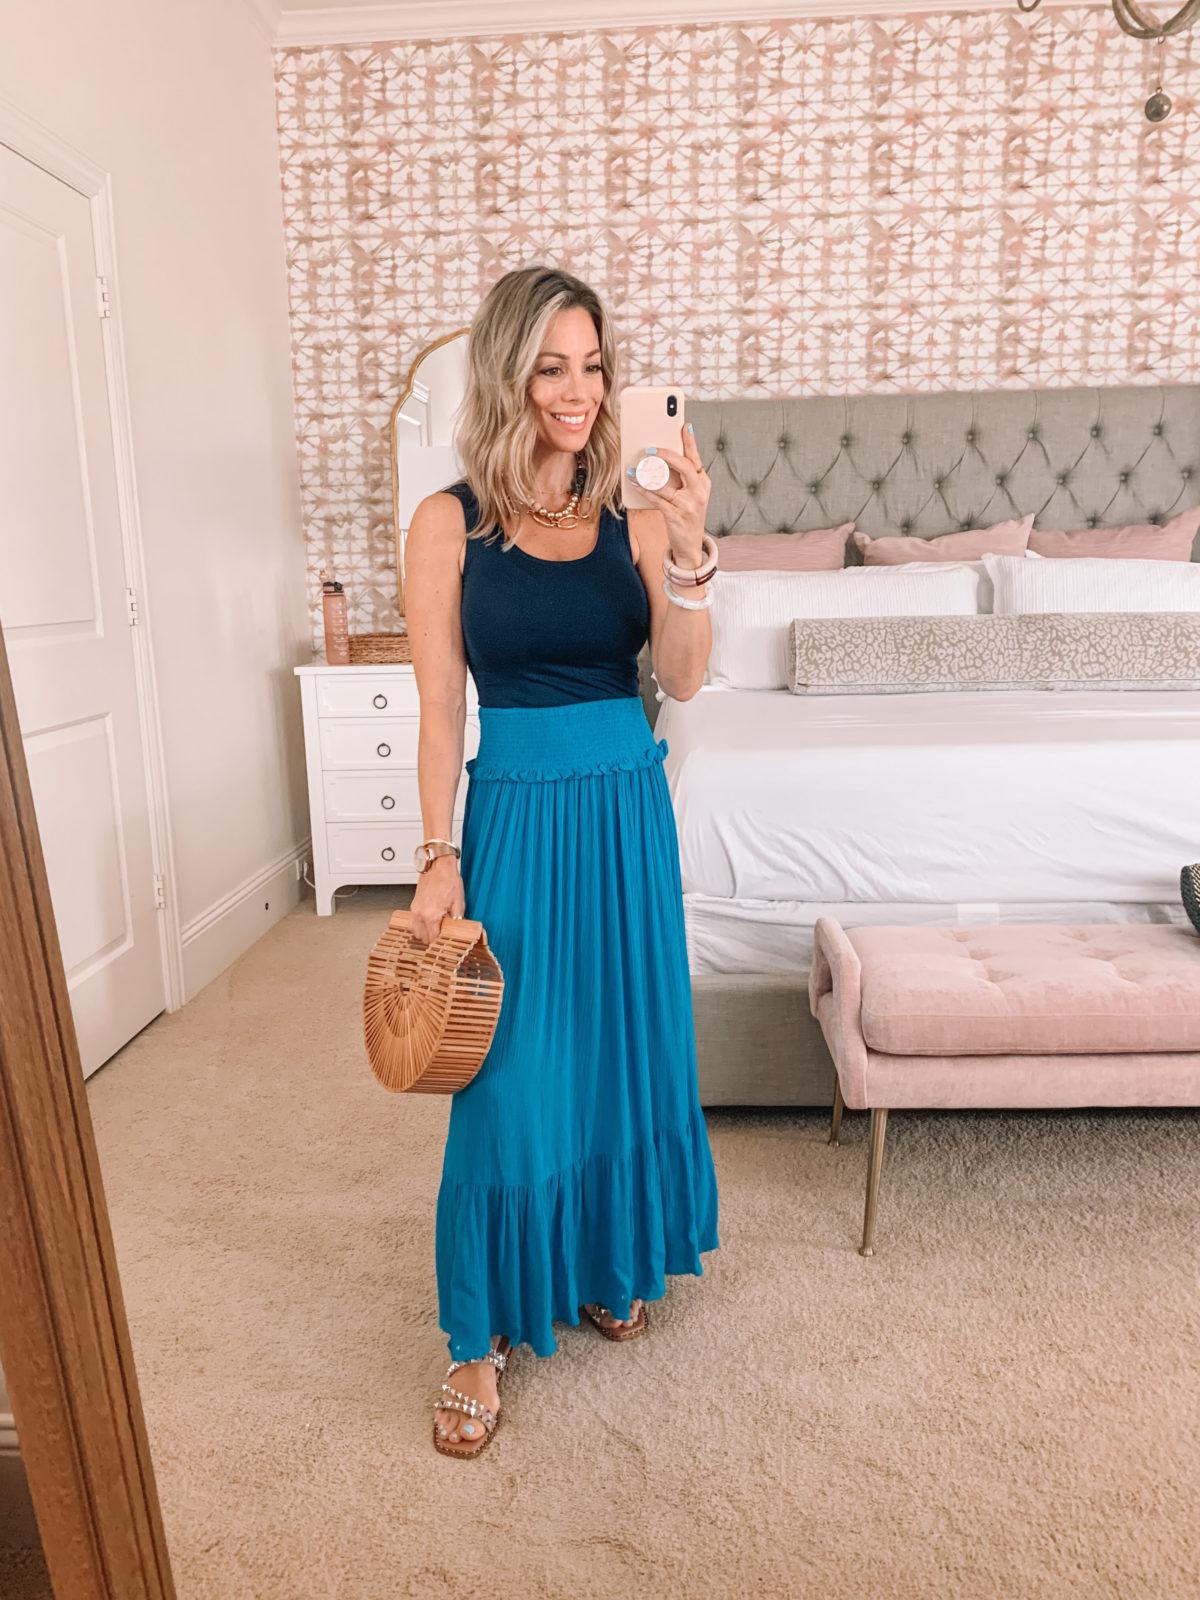 Dressing Room Finds Walmart, Bodysuit, maxi Skirt, Studded Sandals, Bamboo Clutch